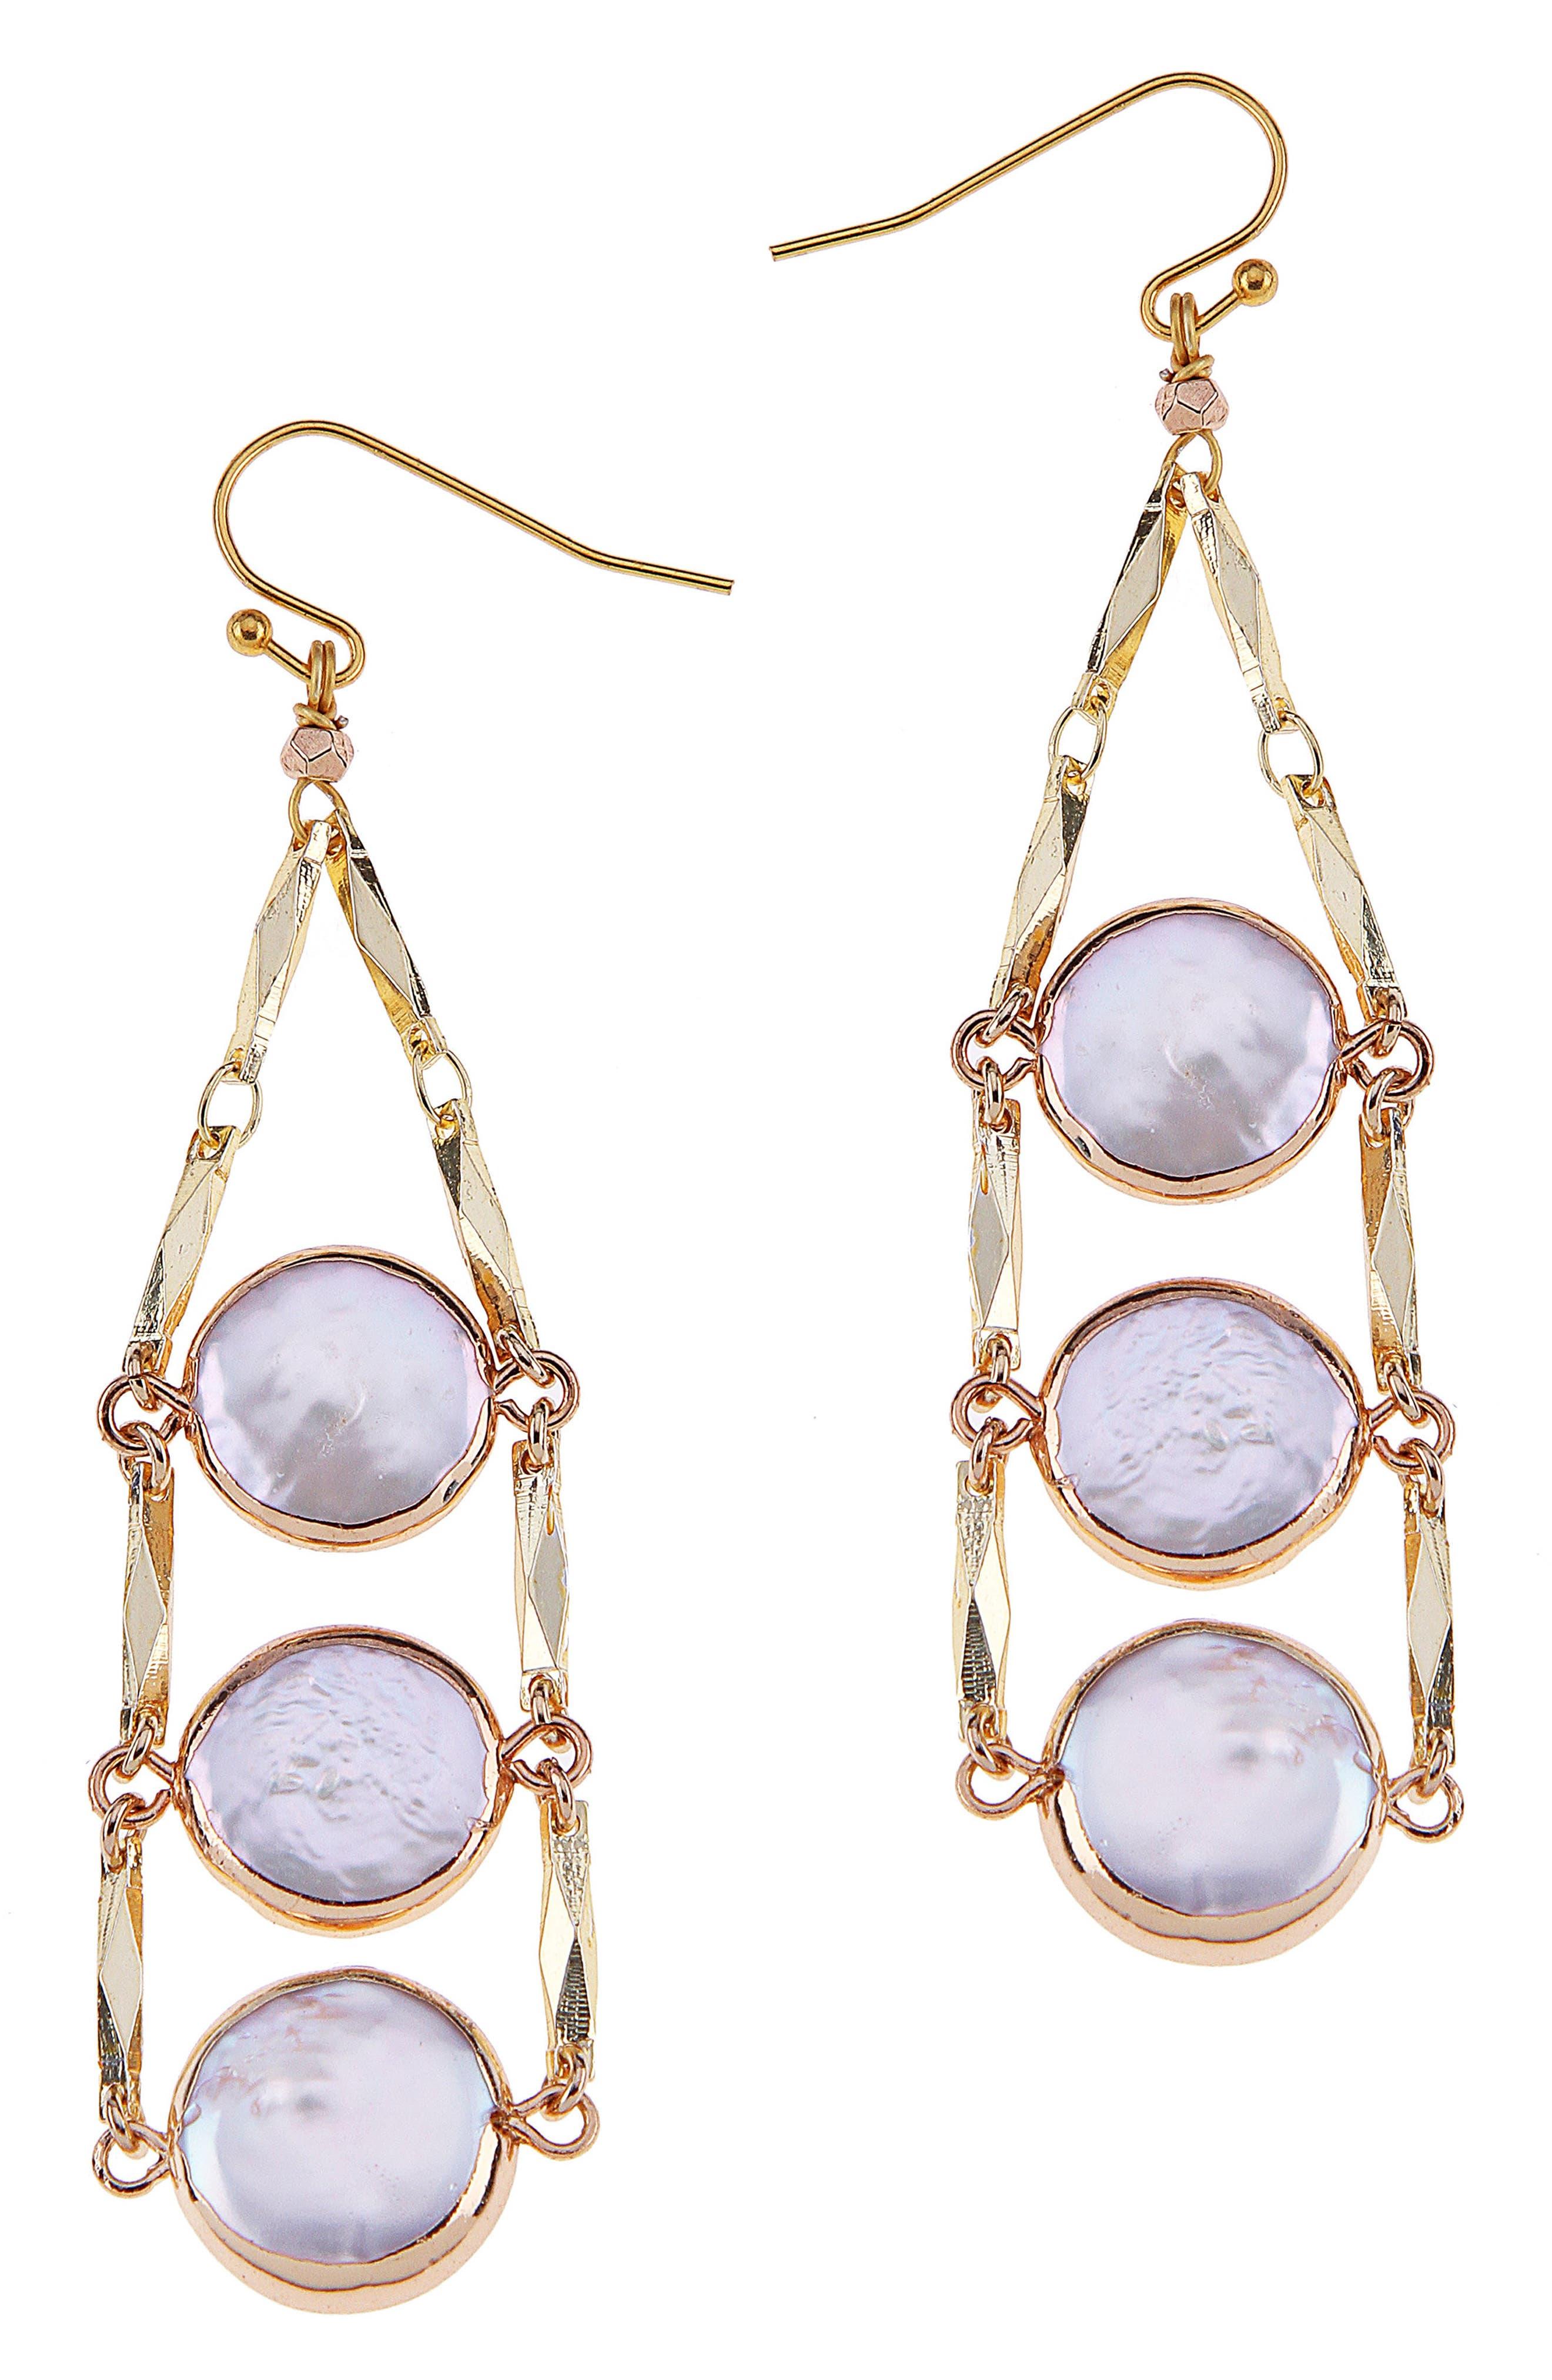 Nakamol Design Triple Coin Freshwater Pearl Drop Earrings